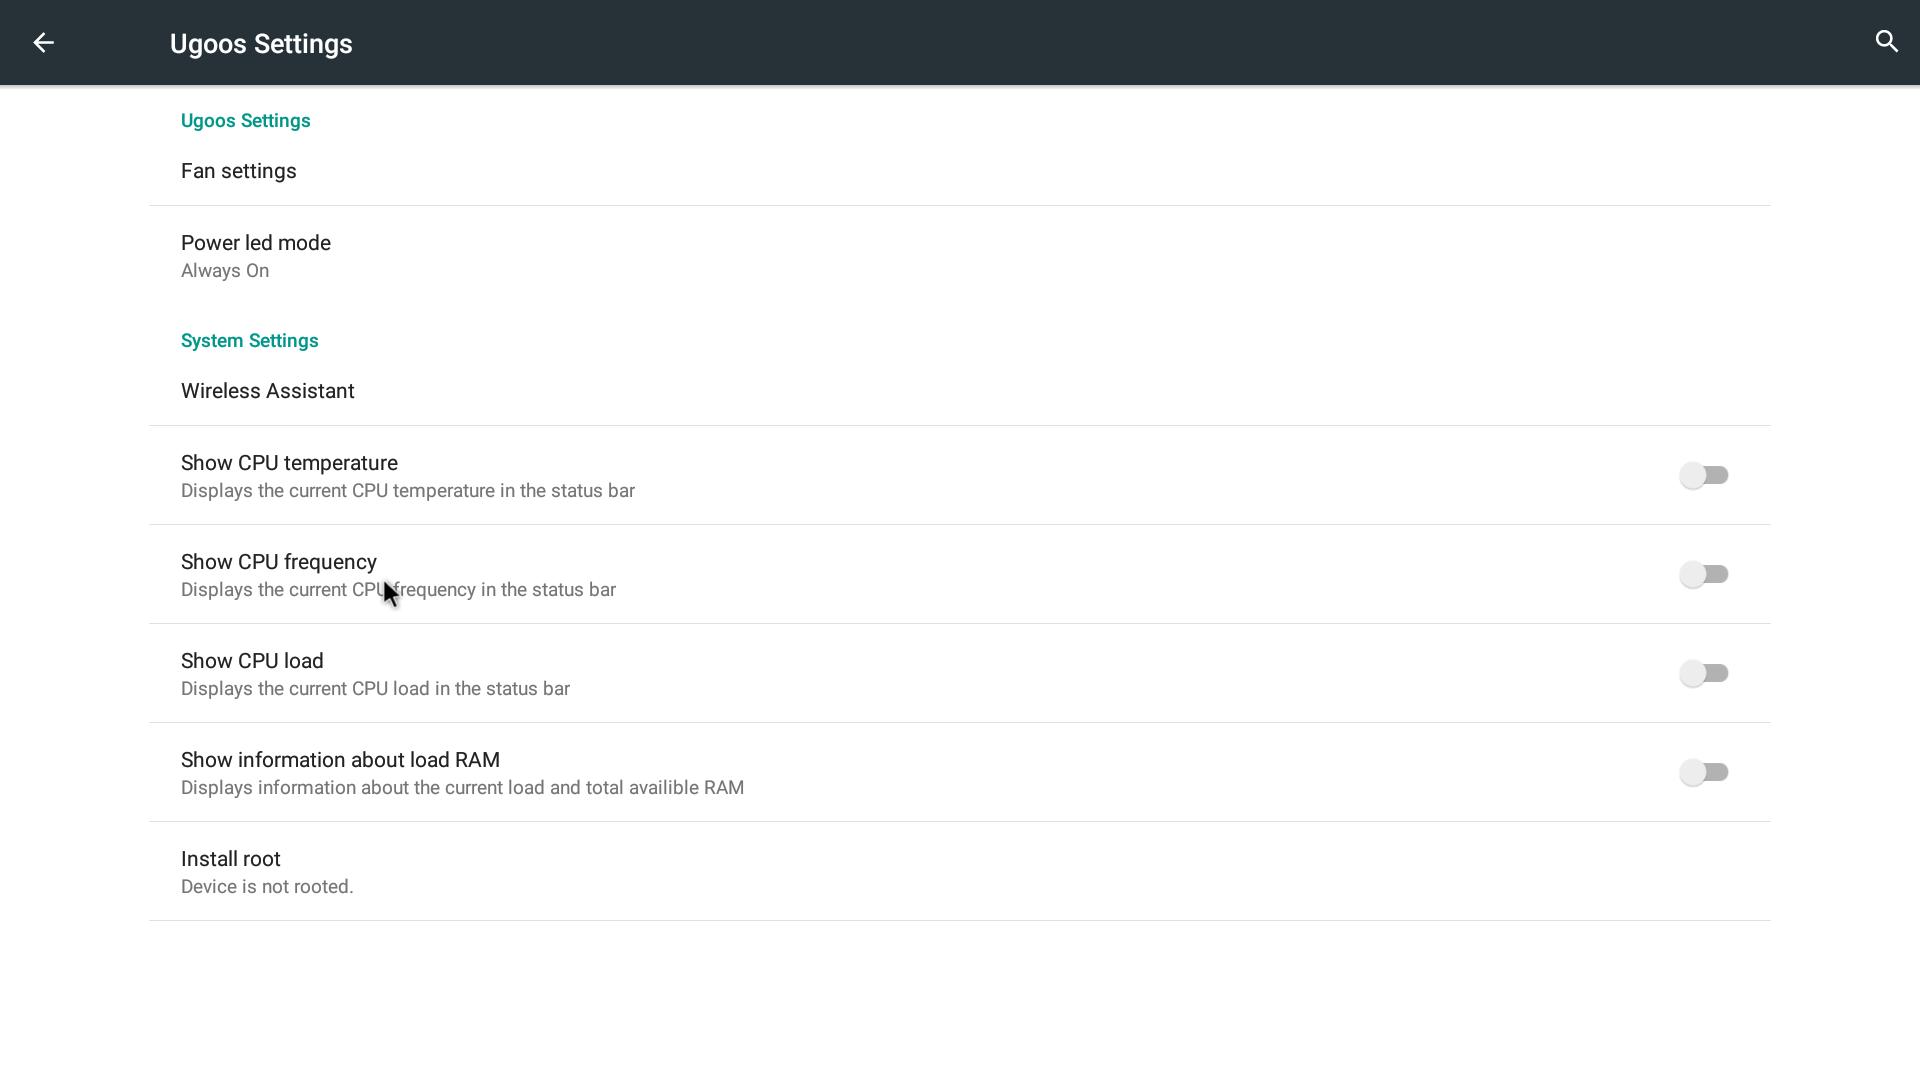 Ugoos UT4 RockChip 3368 firmware version 0 0 2b release